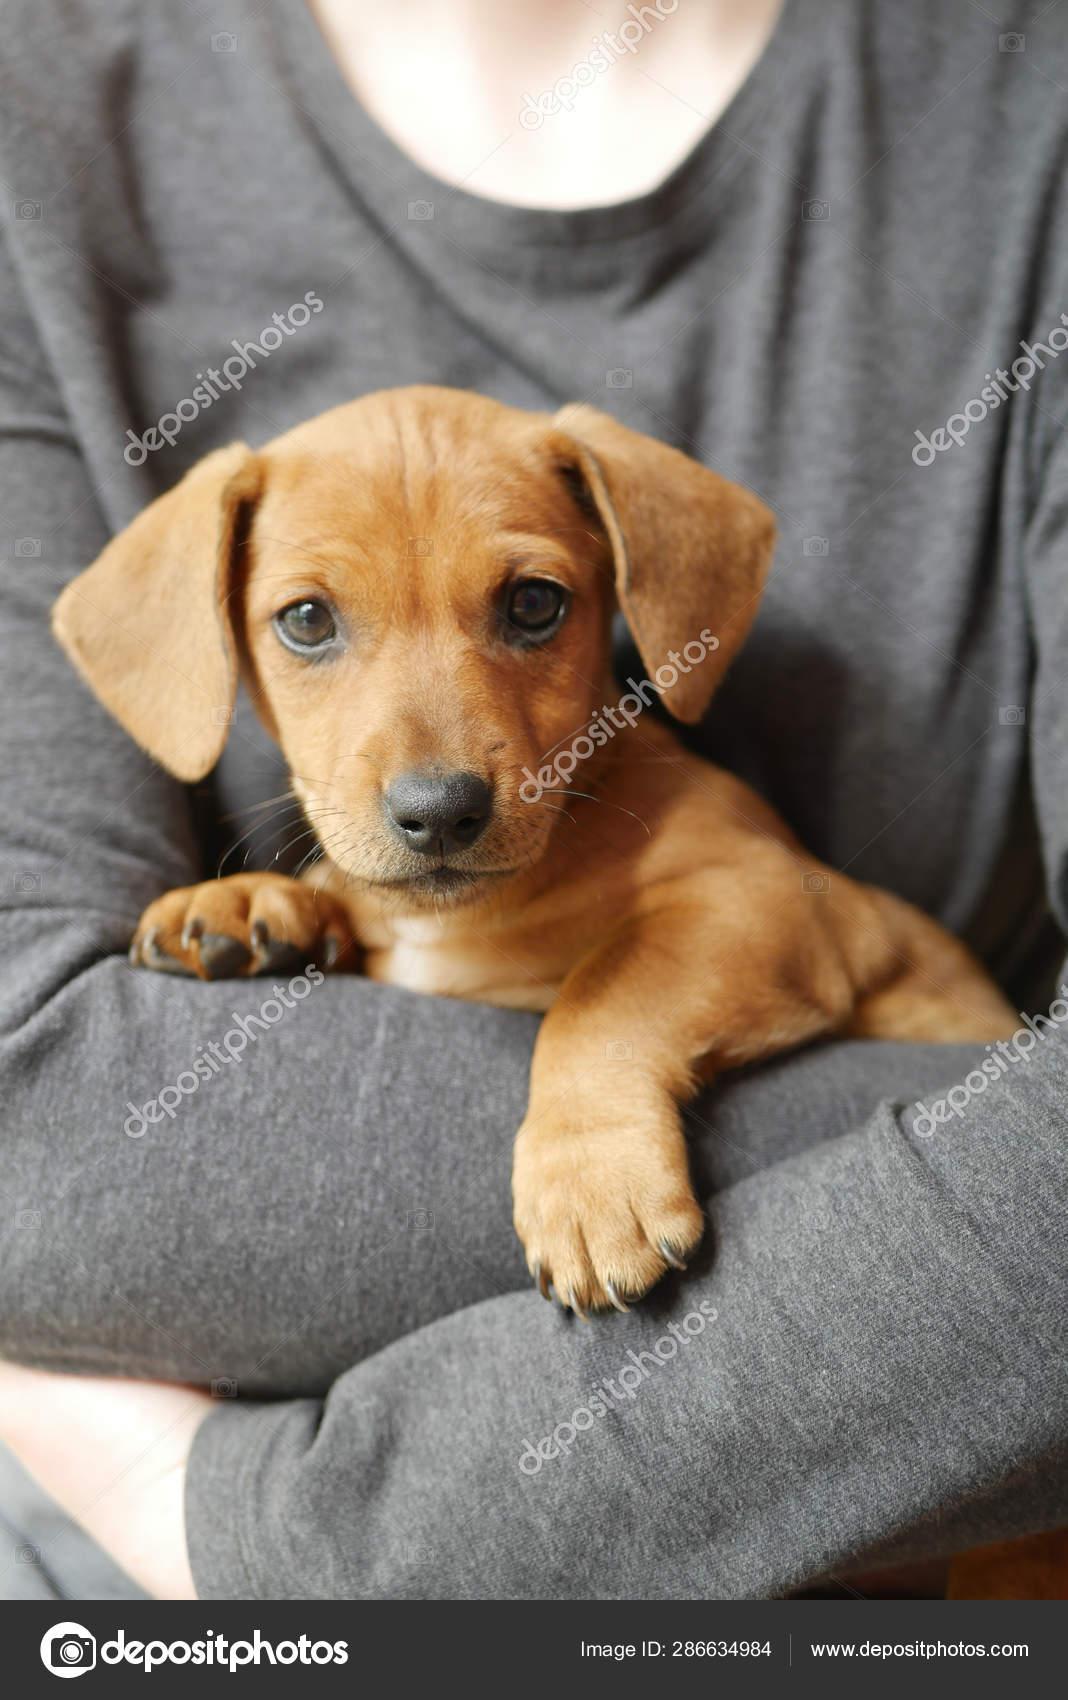 Cute Dachshund Puppy On Hand Stock Photo C Egor 1896 286634984